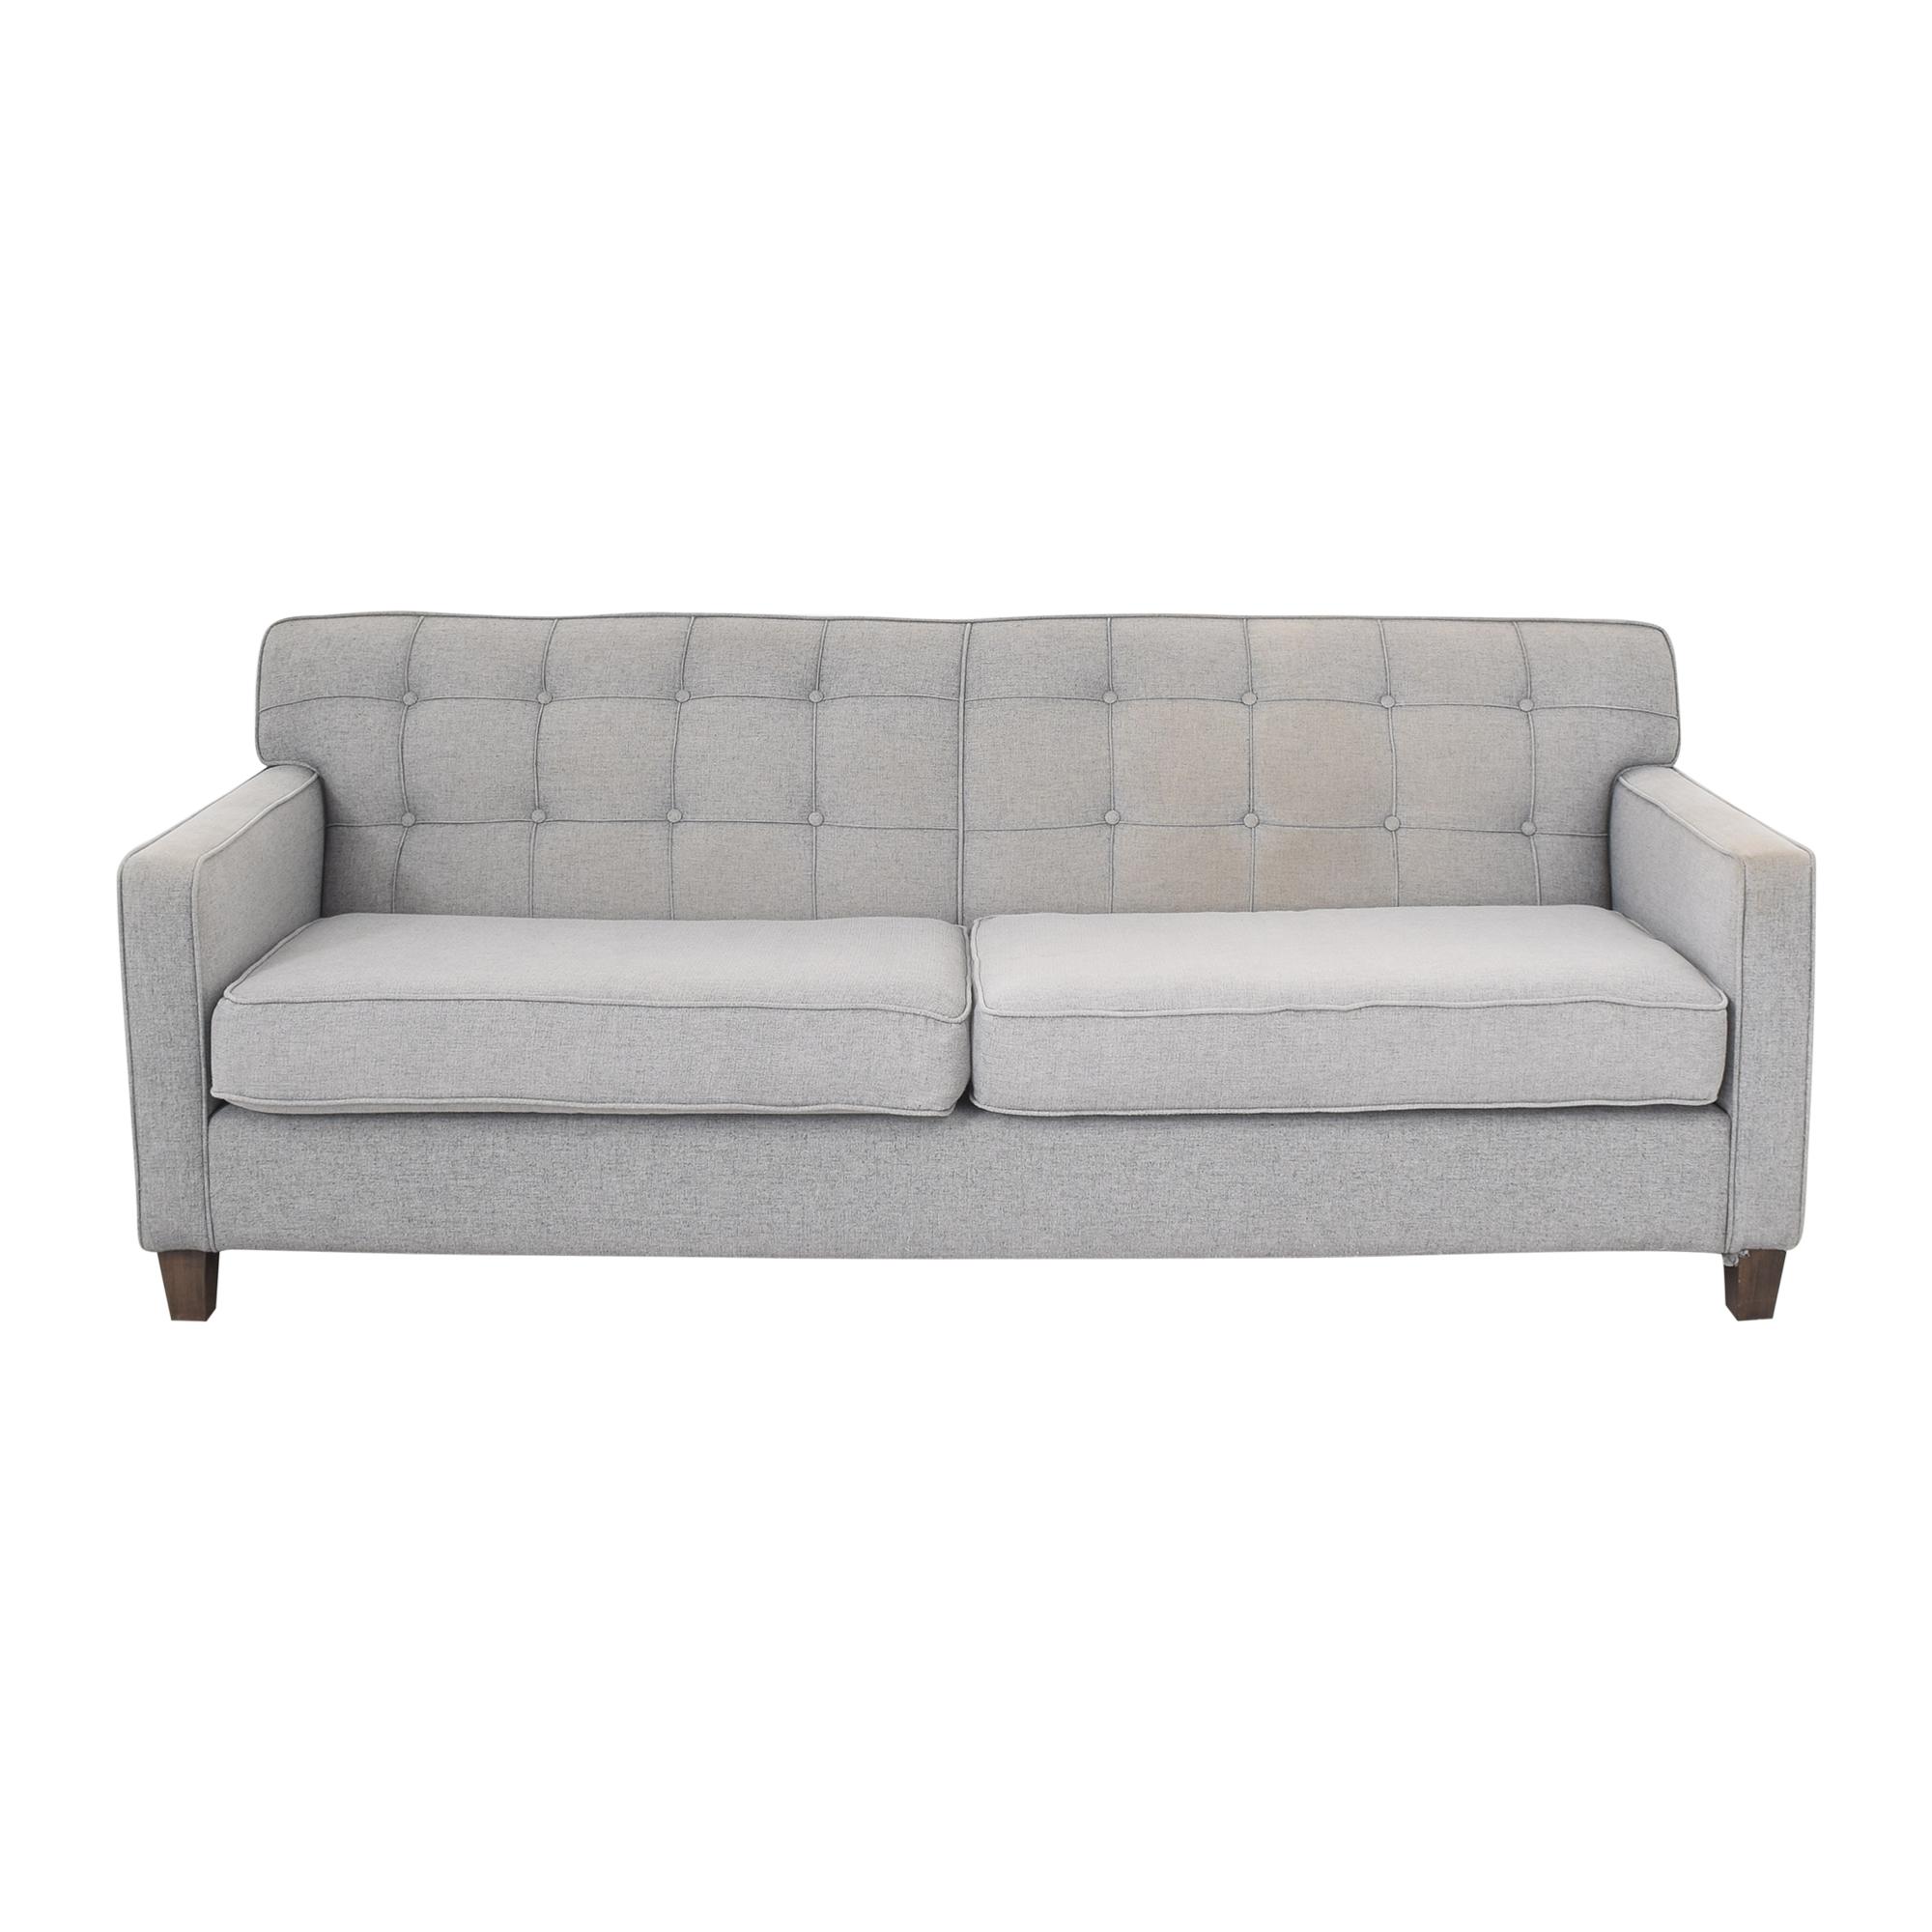 G. Romano G. Romano Tufted Two Cushion Sofa price